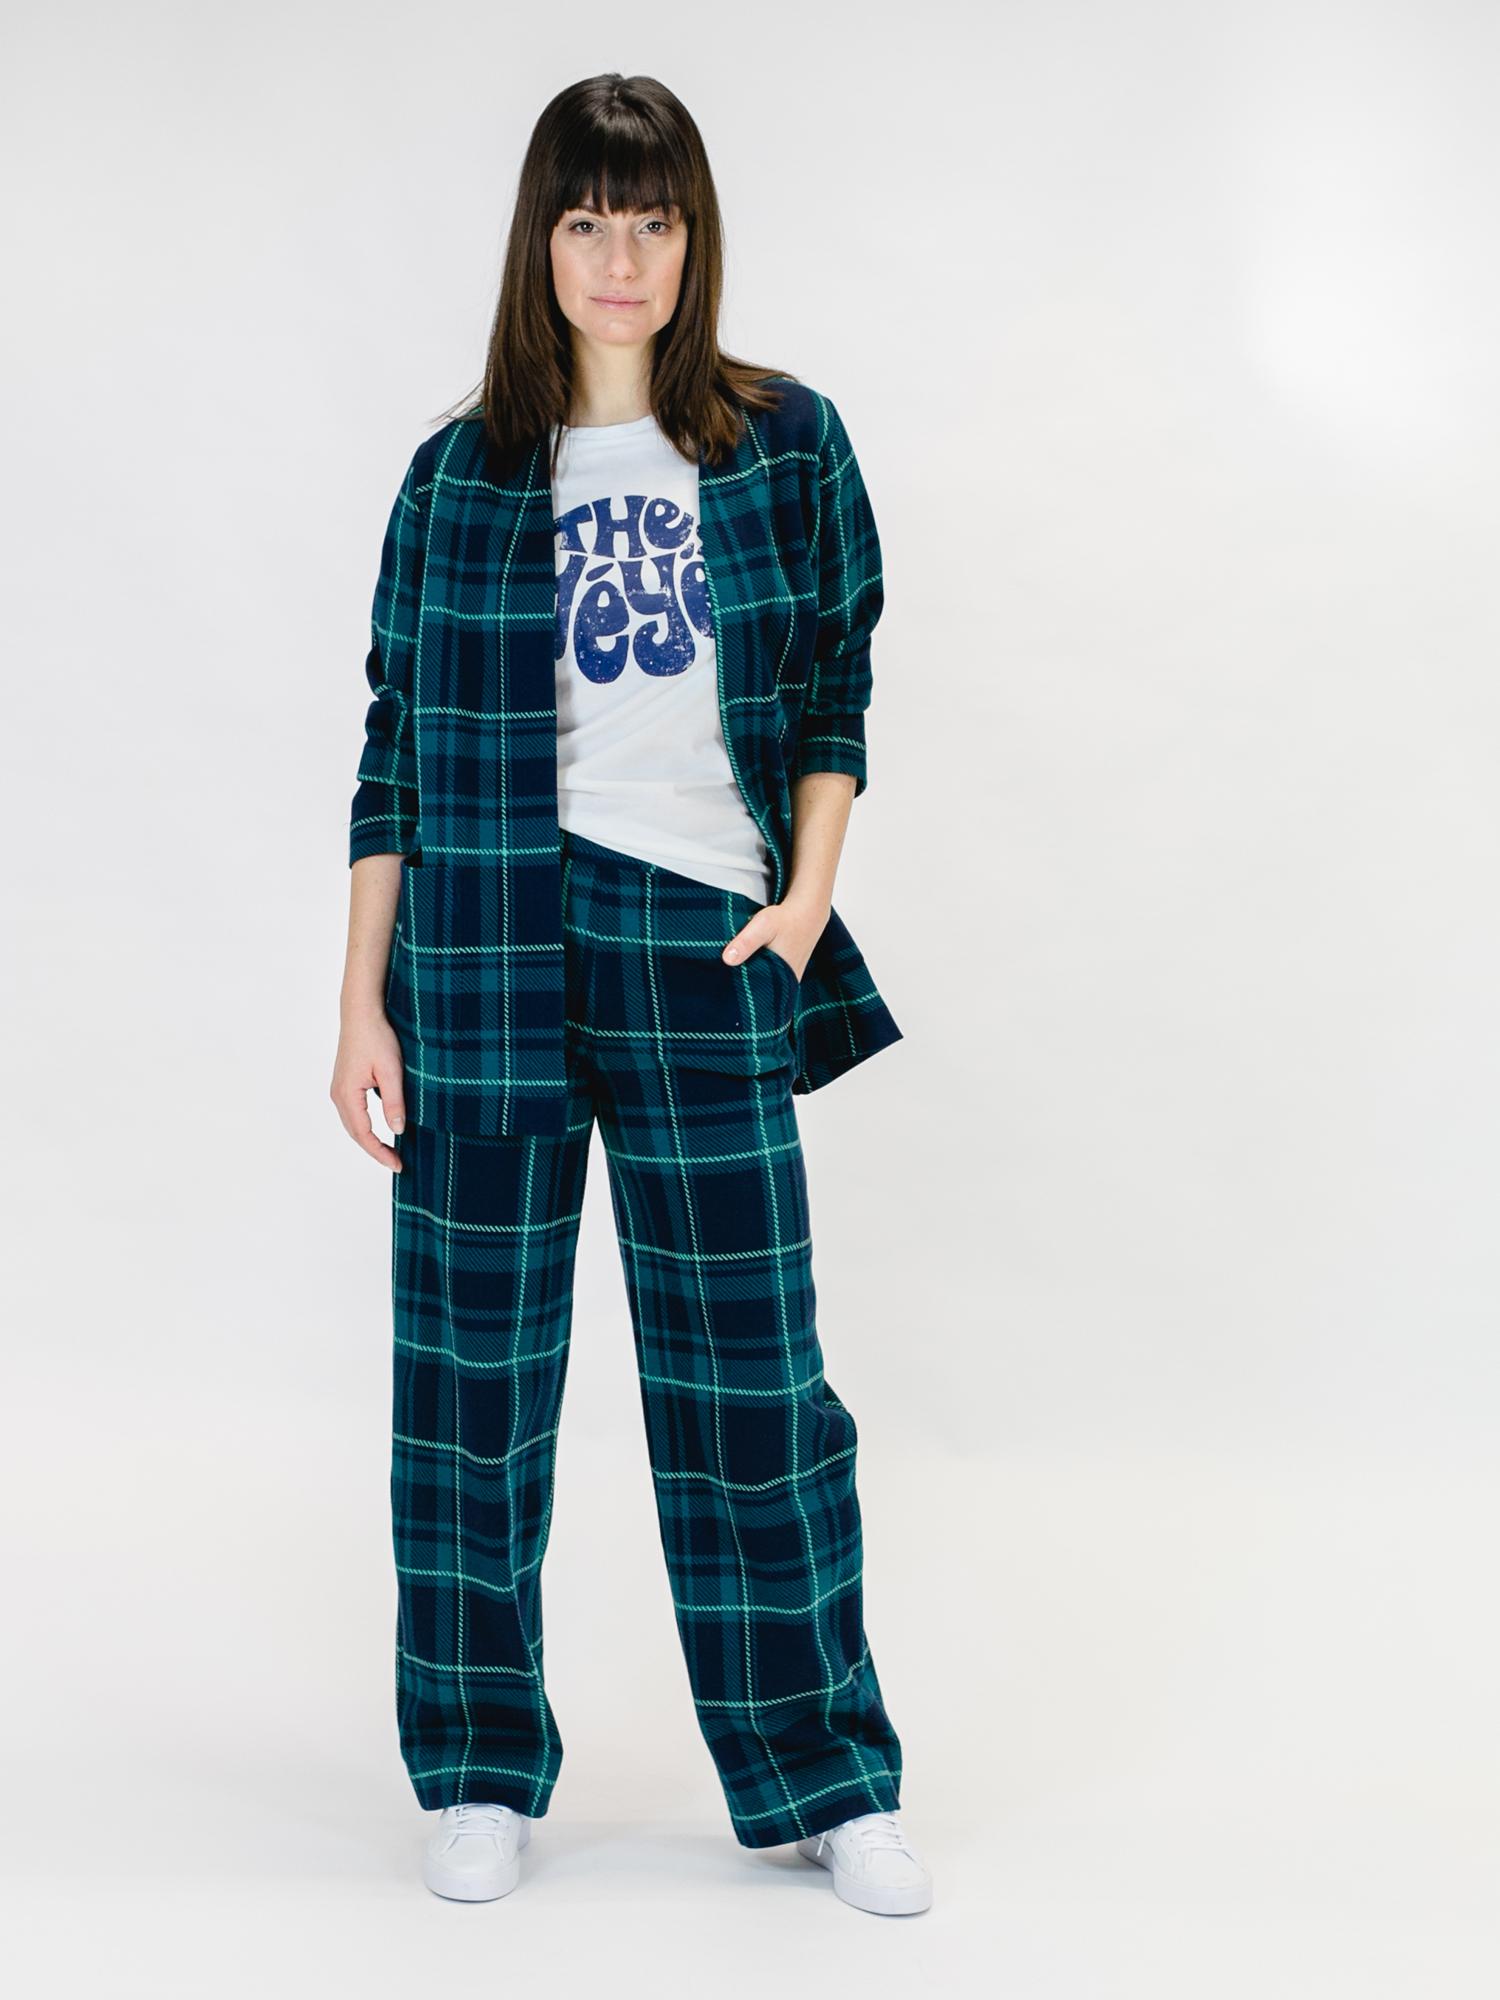 MADEMOISELLE-YEYE-ONE-STEP-BEYOND-Trousers-Hose-tartan-blue-green-5